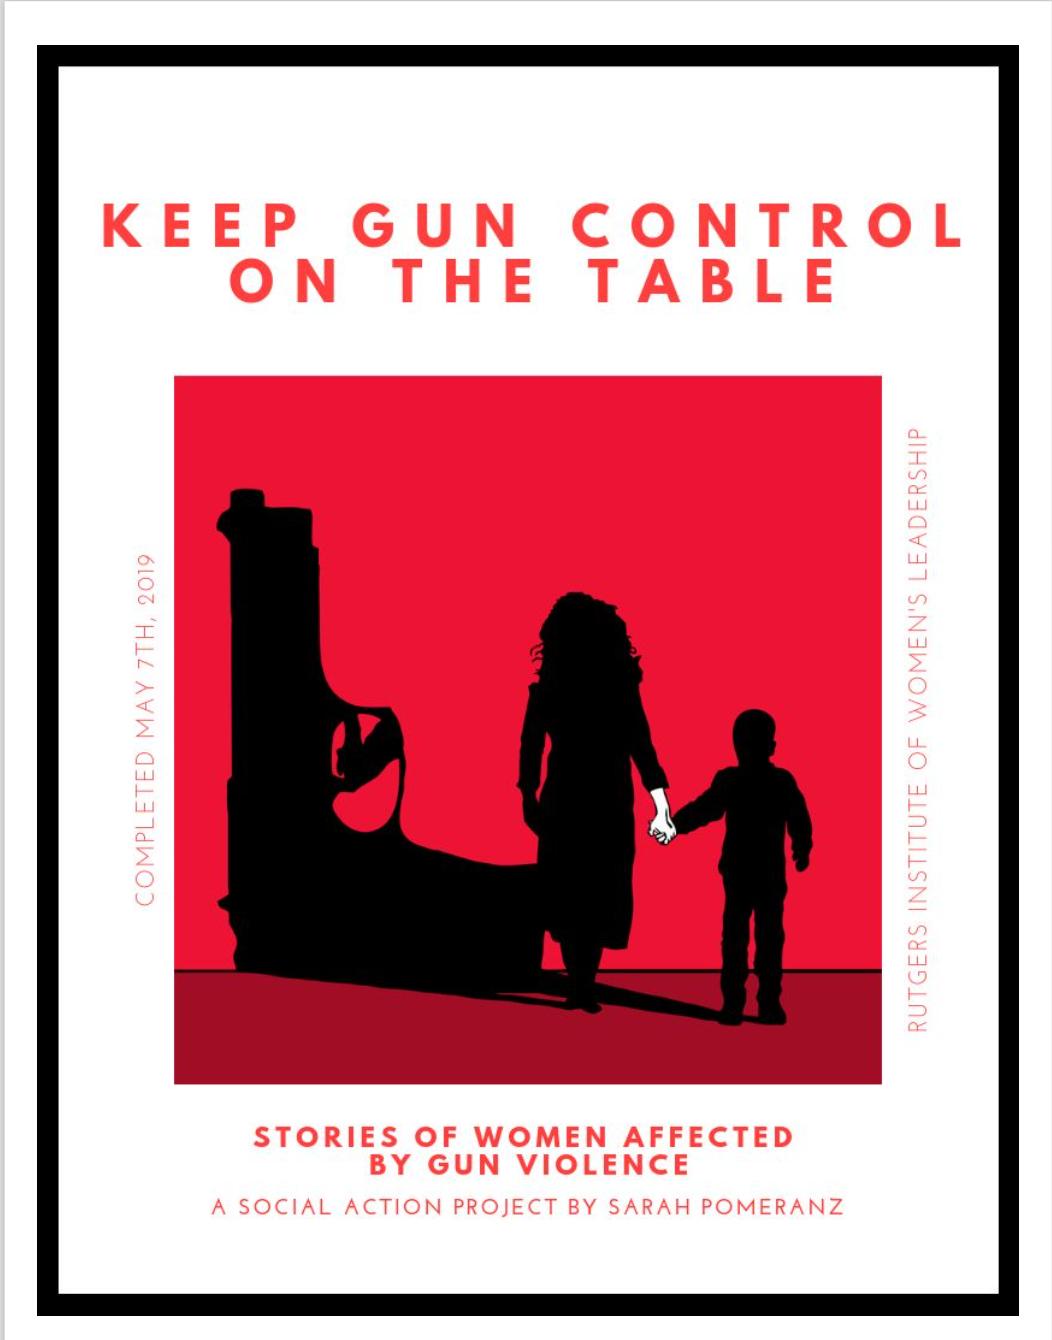 Keep Gun Control on the Table